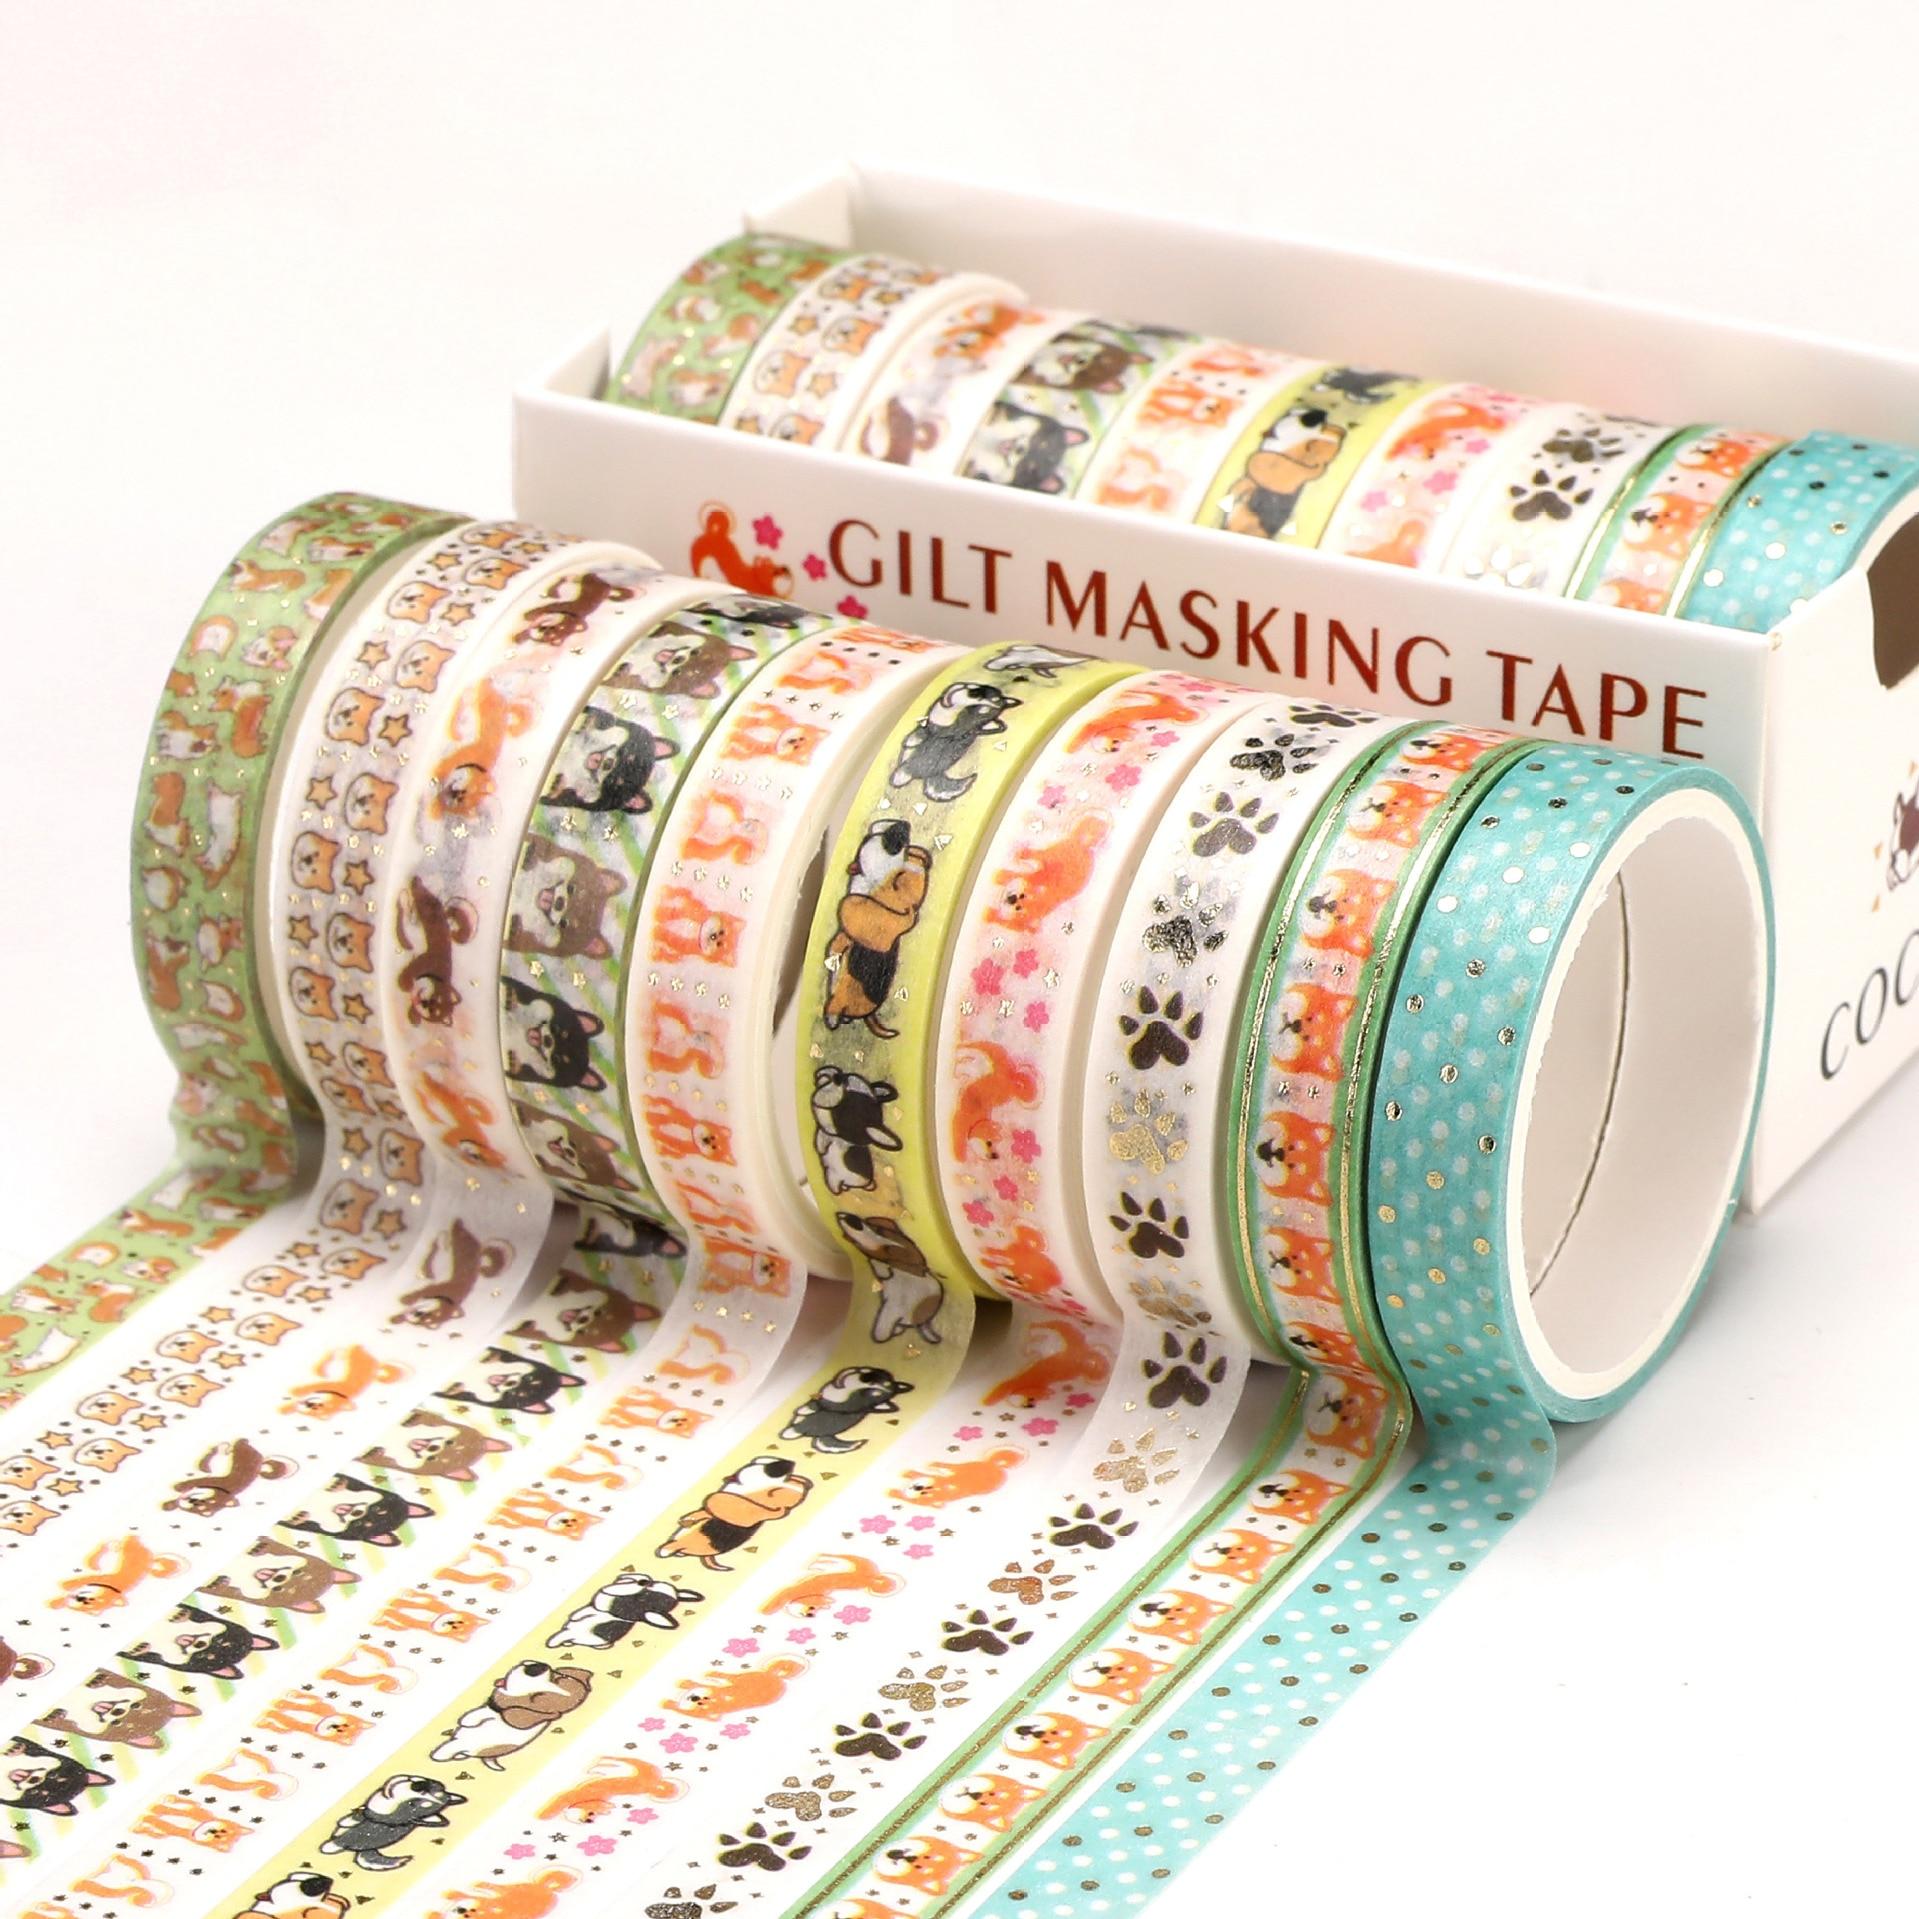 10 Pcs/Set Gold Foil Washi Tape Cute Heart Masking Tape Decorative Adhesive Tape Sticker Scrapbooking DIY  Stationery 5